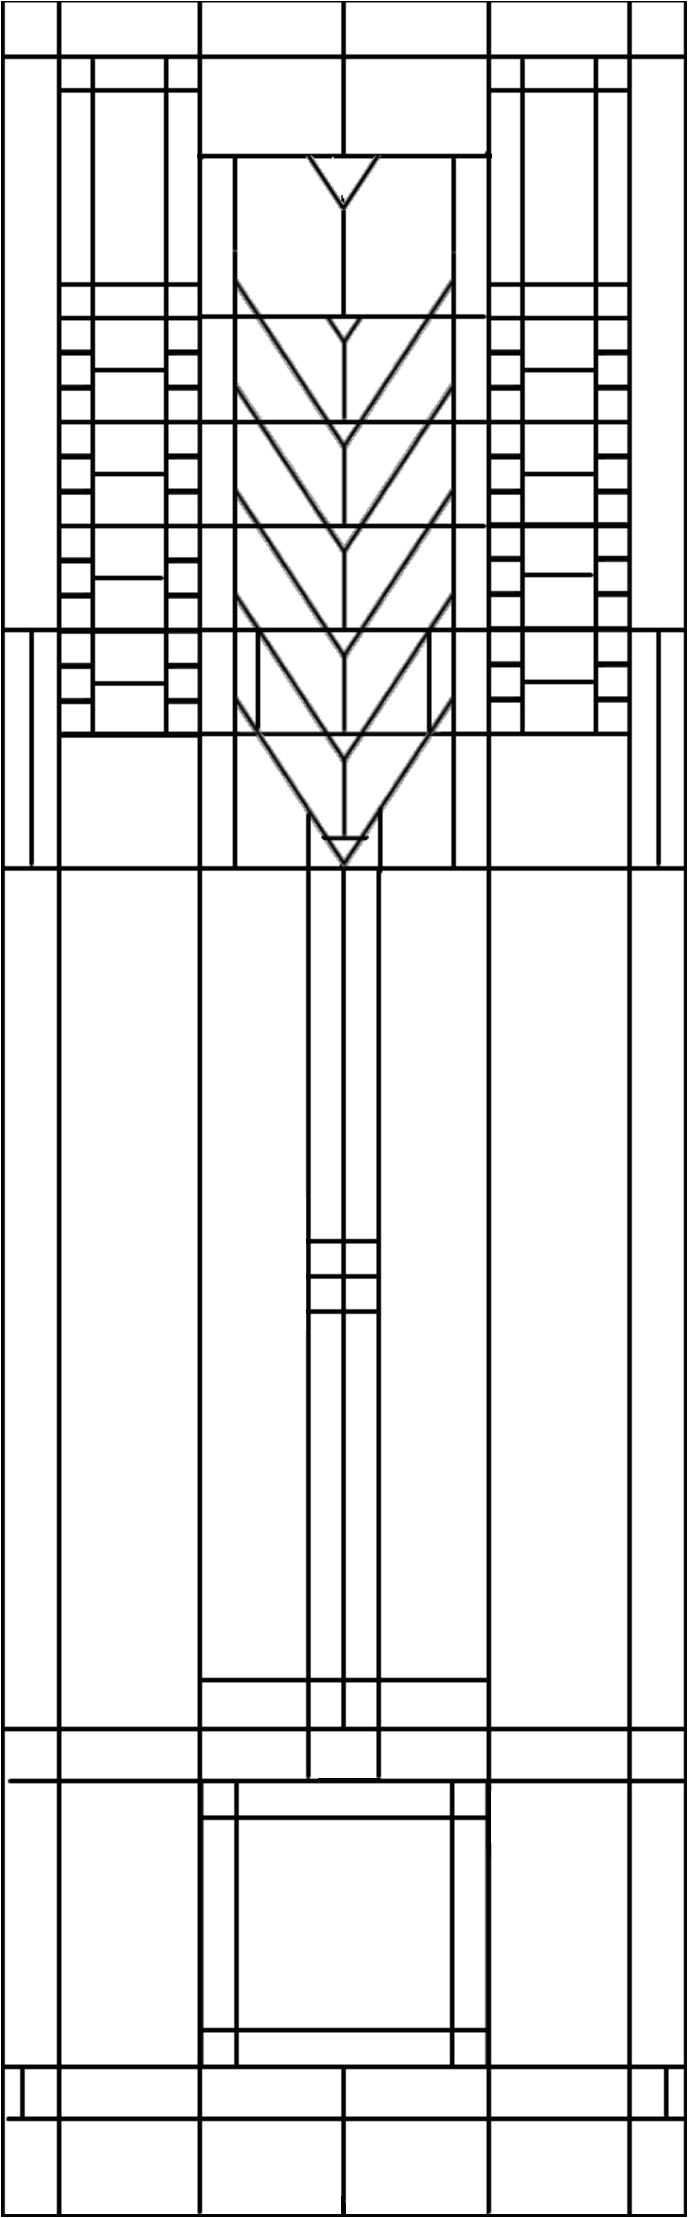 Frank Lloyd Wright Tree Of Life Quilt Pattern Frank Lloyd Wright Patterns Google Search Lcc Project